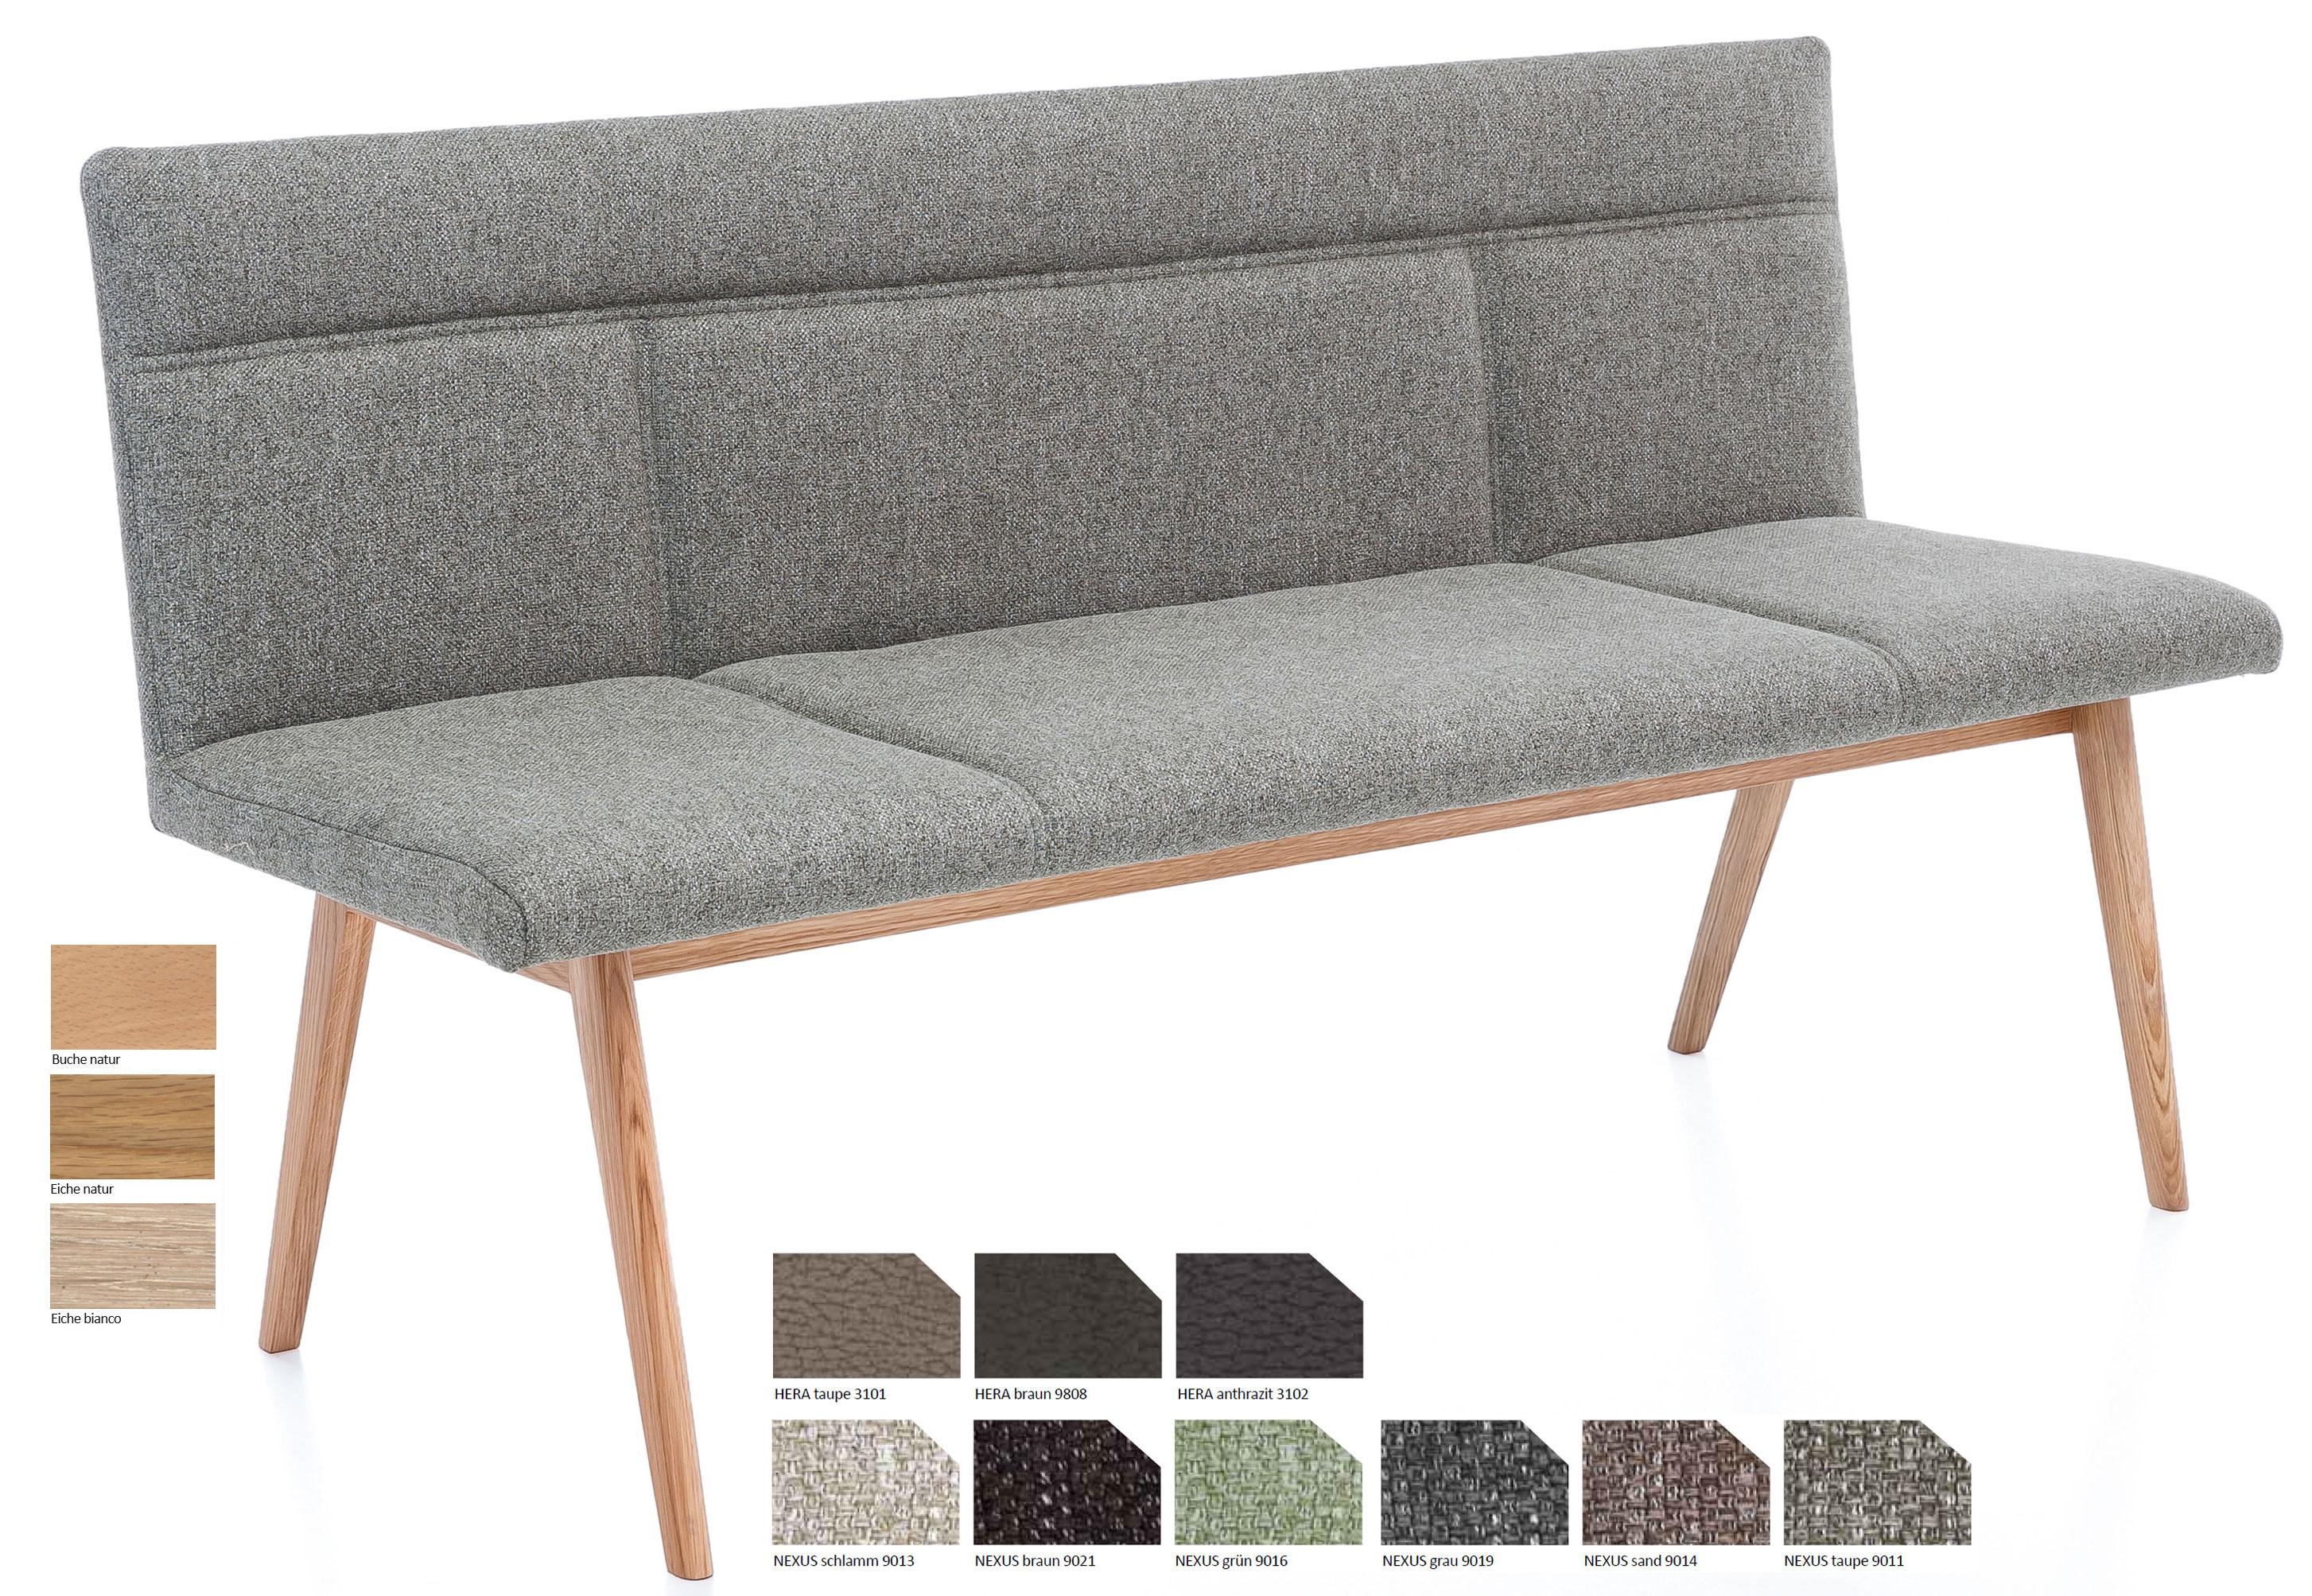 Standard Furniture Alina Polsterbank eiche